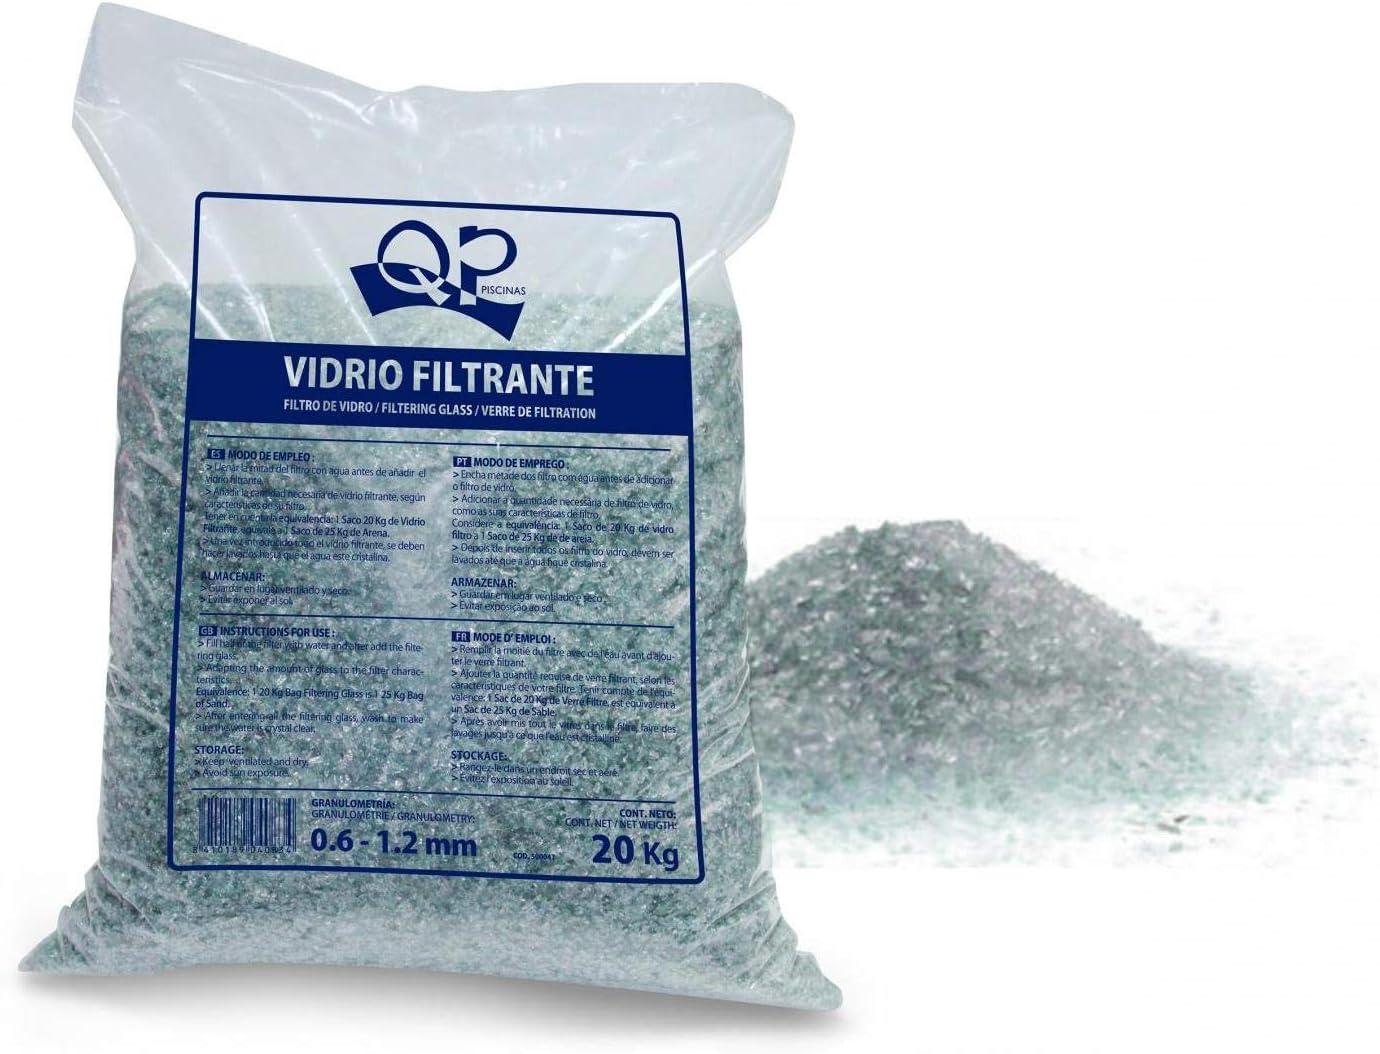 Productos QP Saco de vidrio filtrante para piscinas, 20Kg - QP 500047